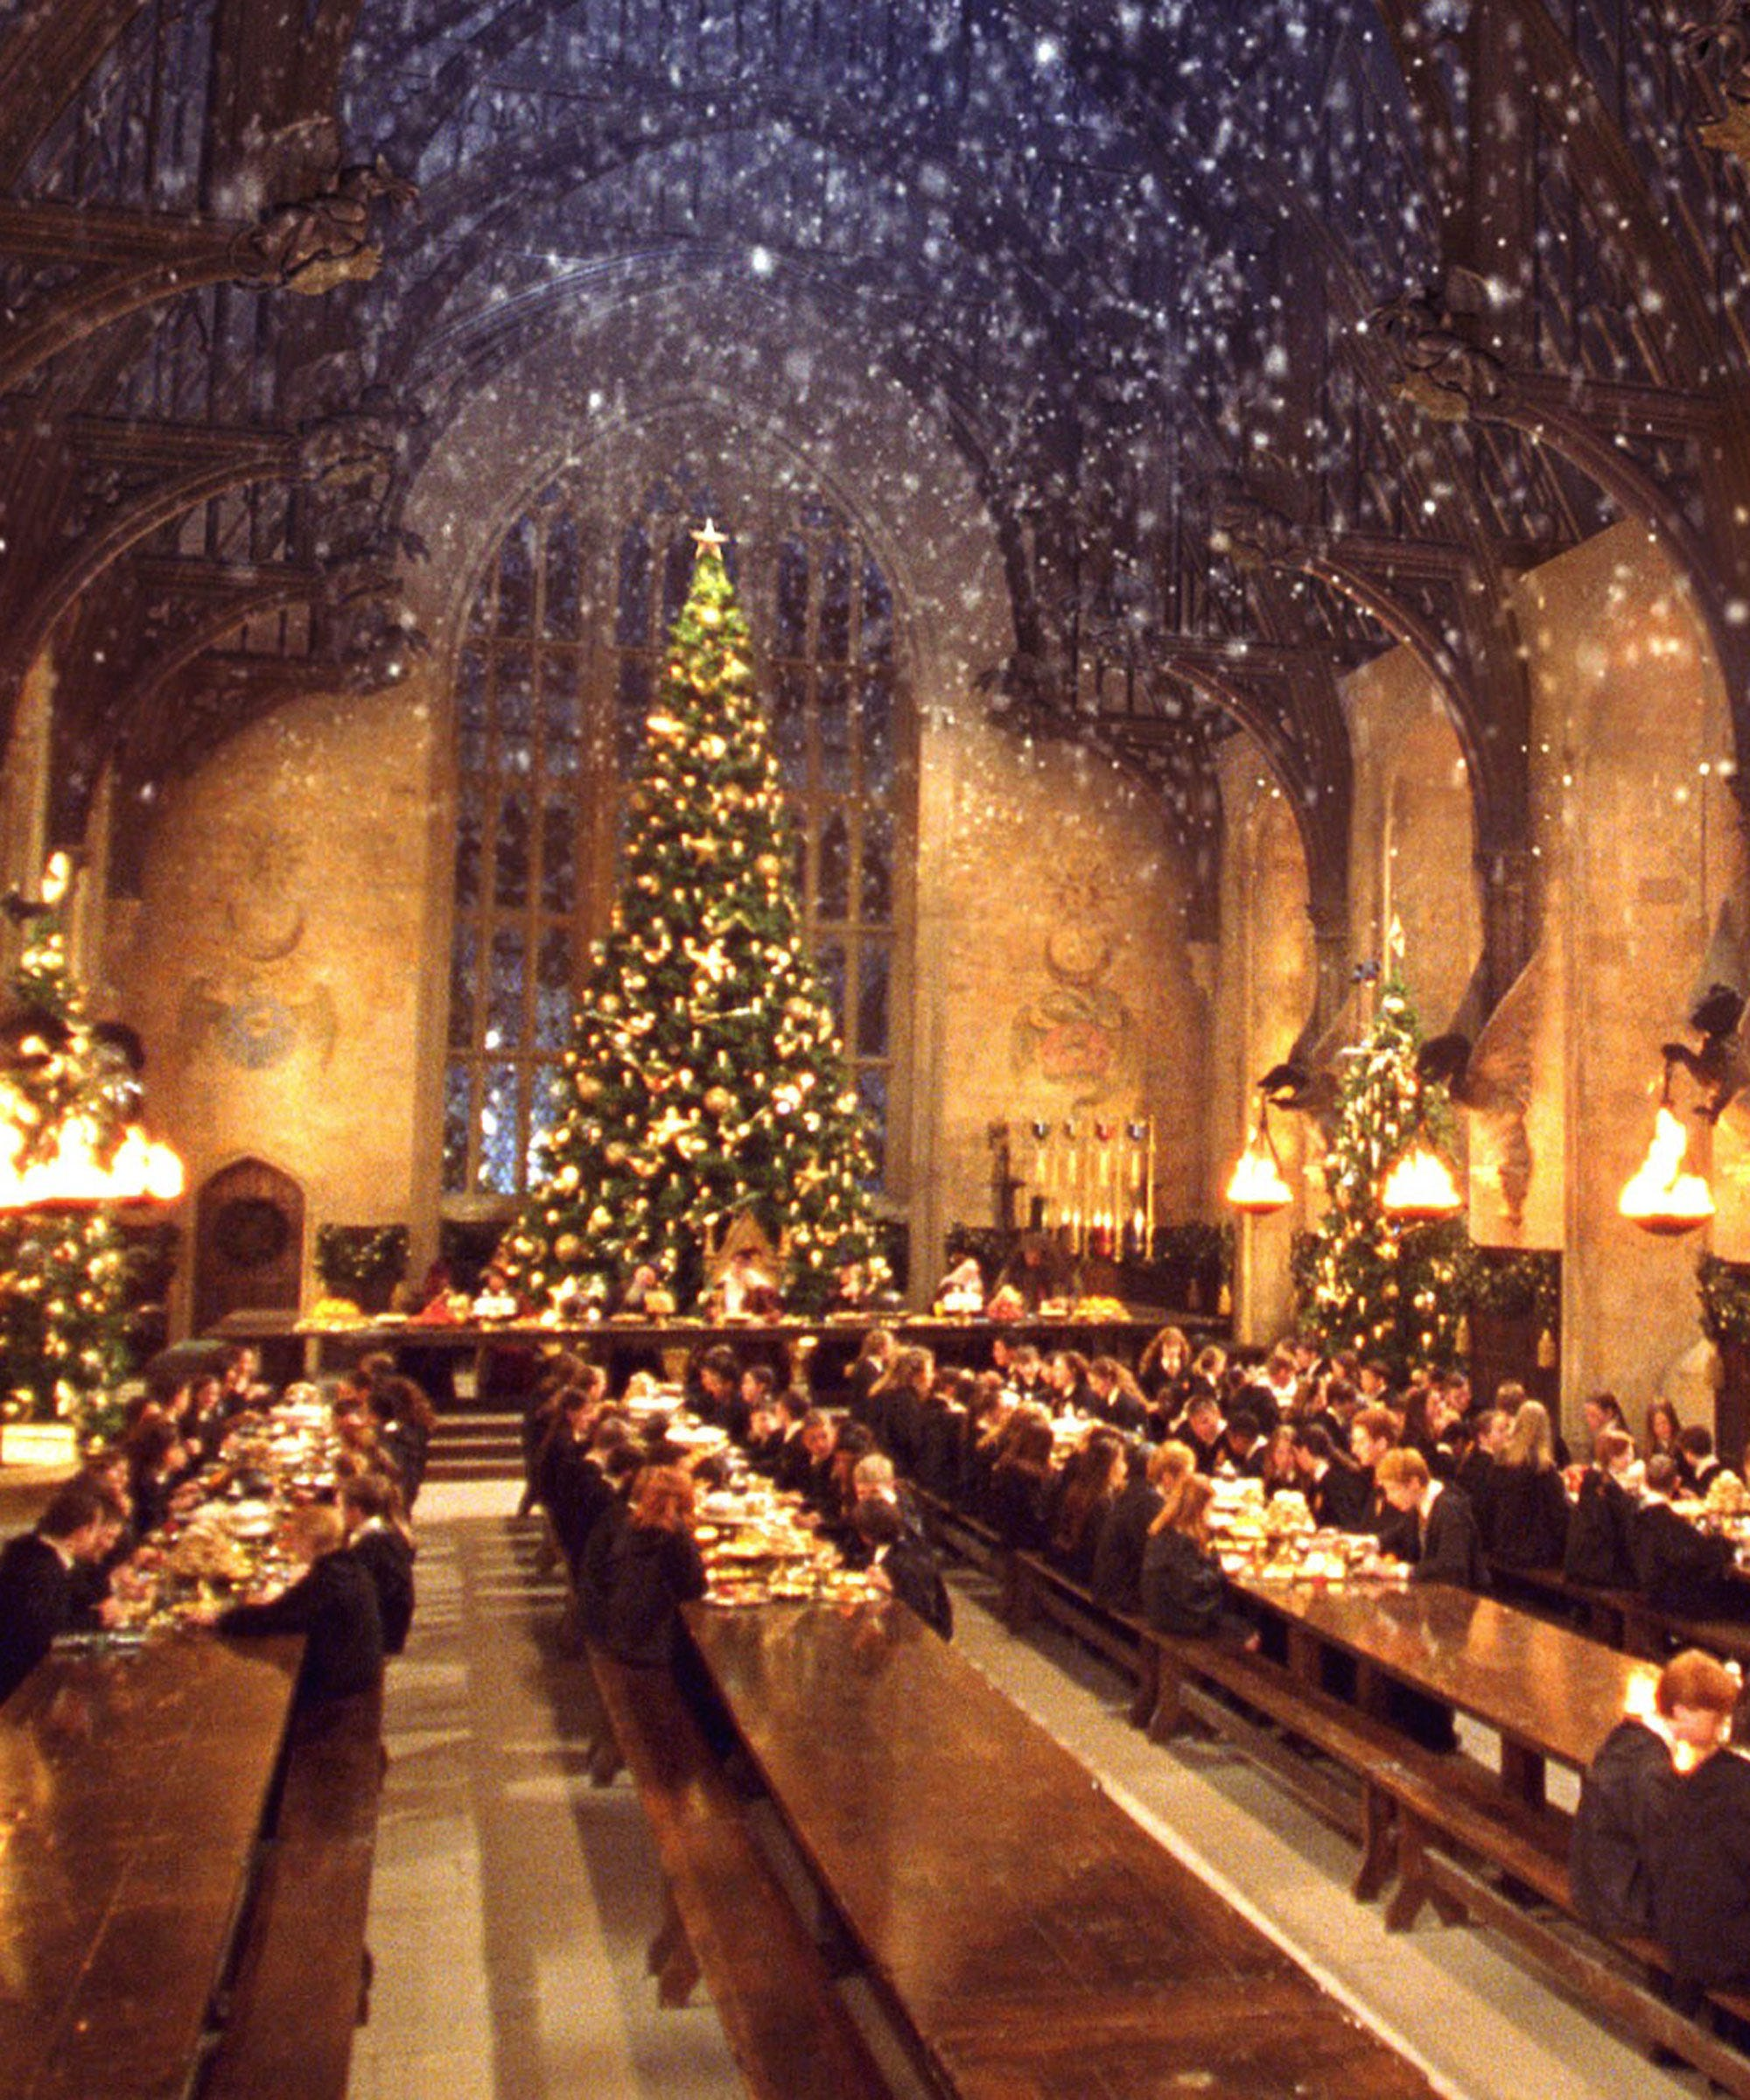 Harry Potter Christmas.Harry Potter Christmas Tree